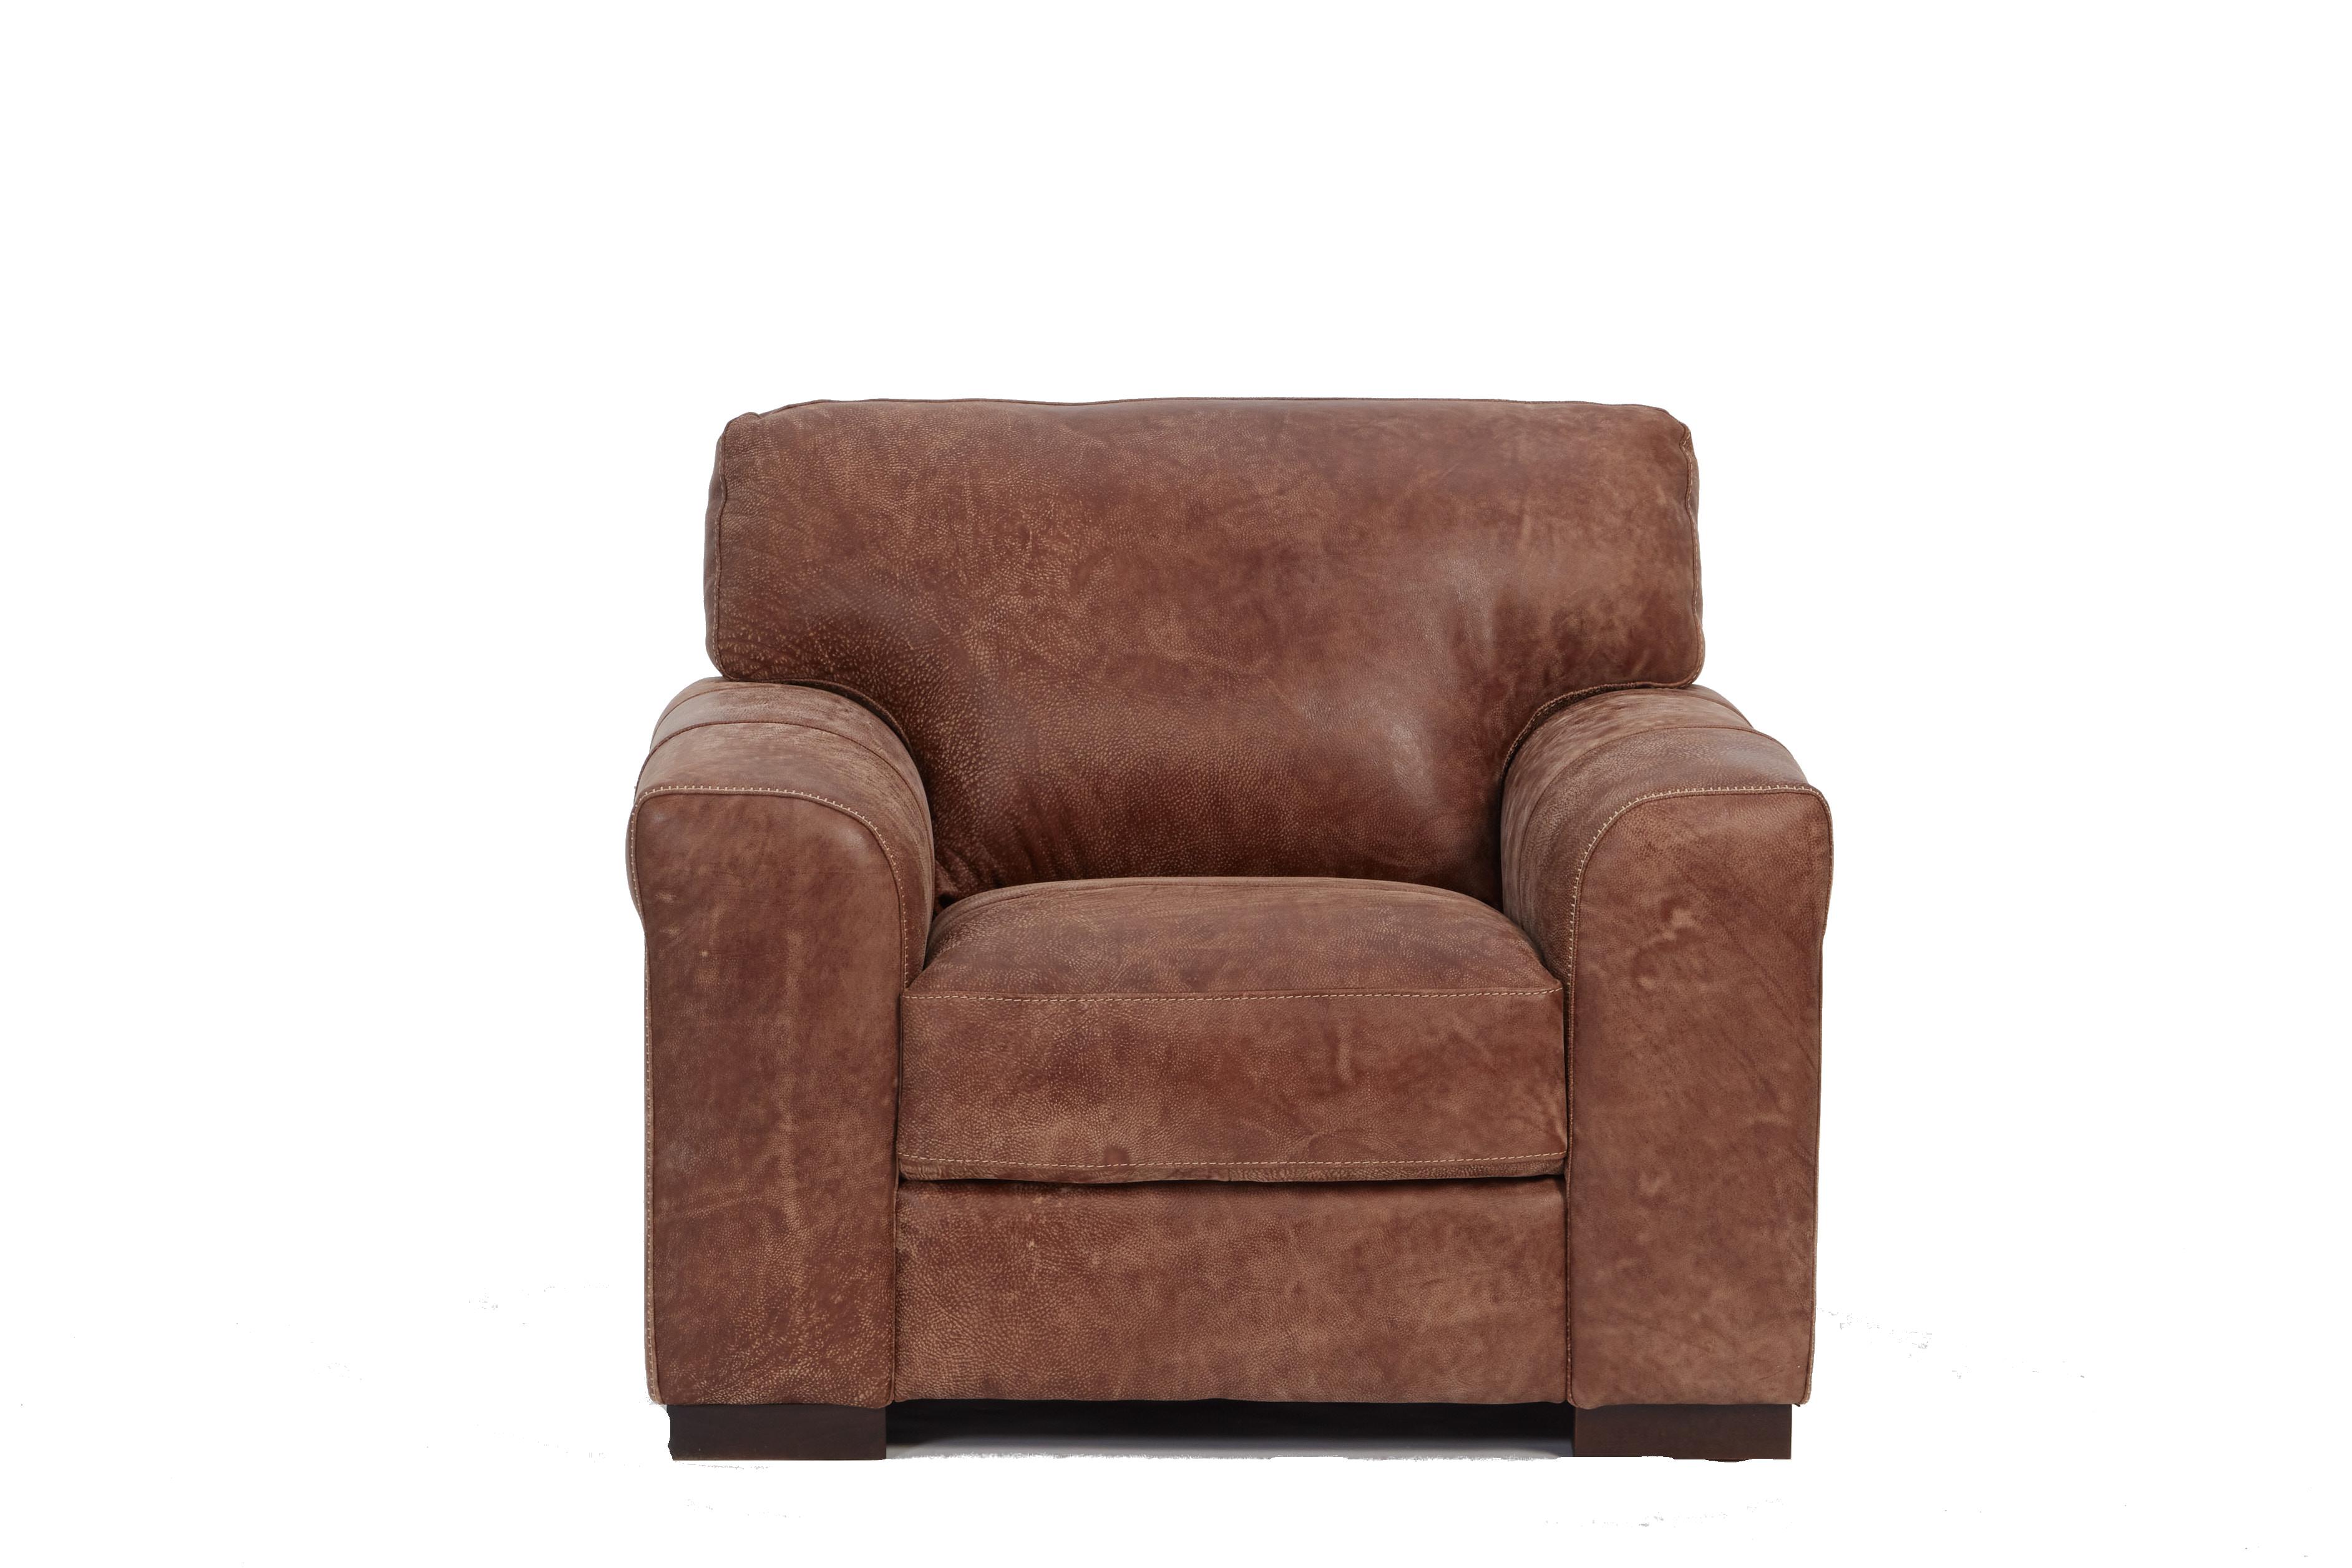 Sovana Chair